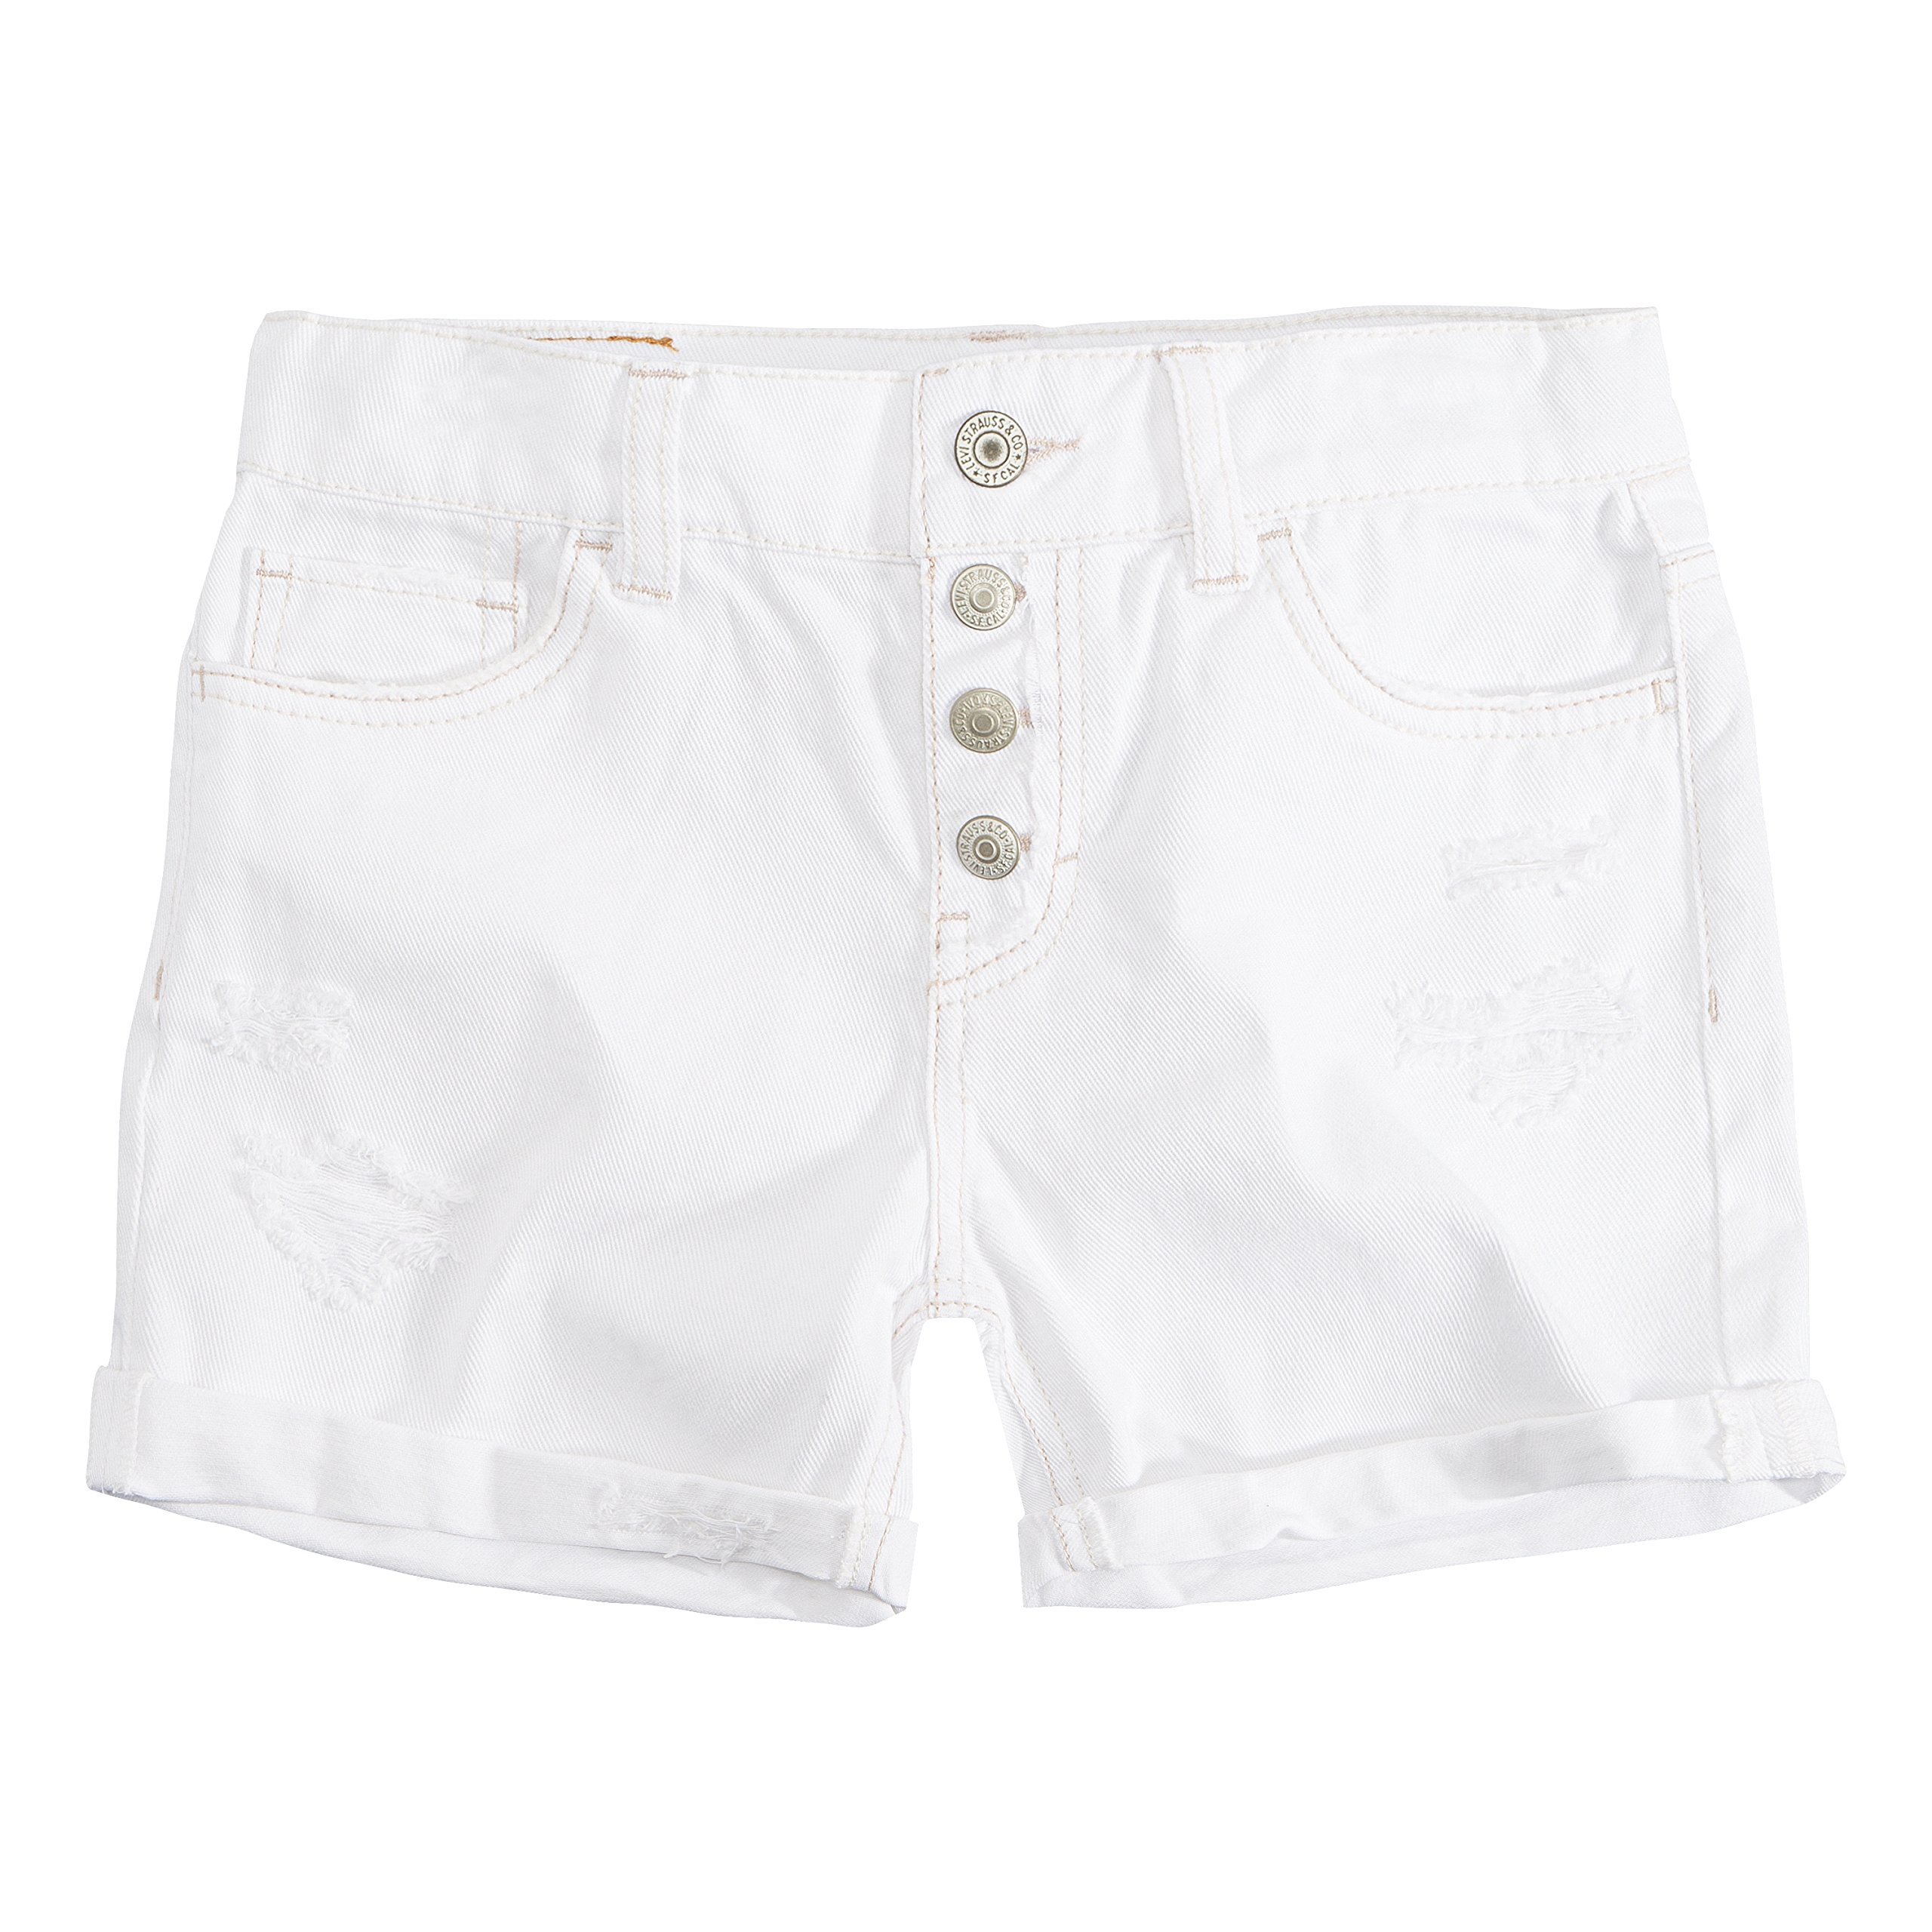 Levi's Girls' Big Girlfriend Fit Shorty Shorts, White, 10